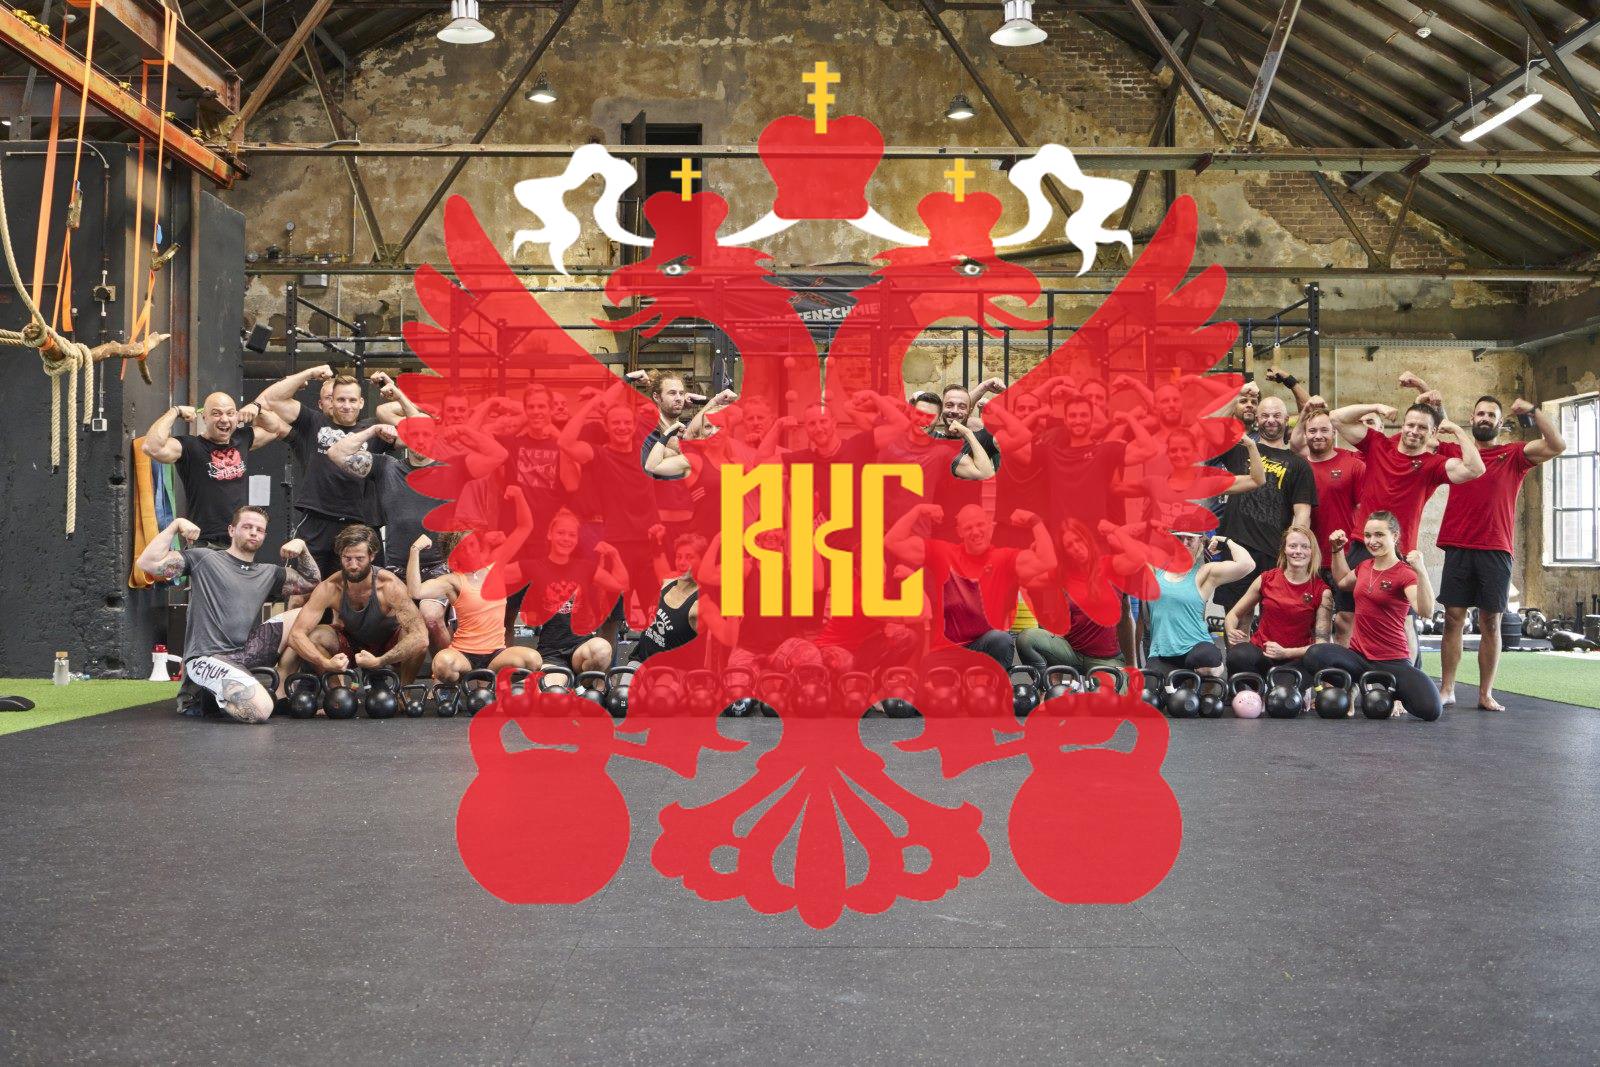 RKC – School of strength